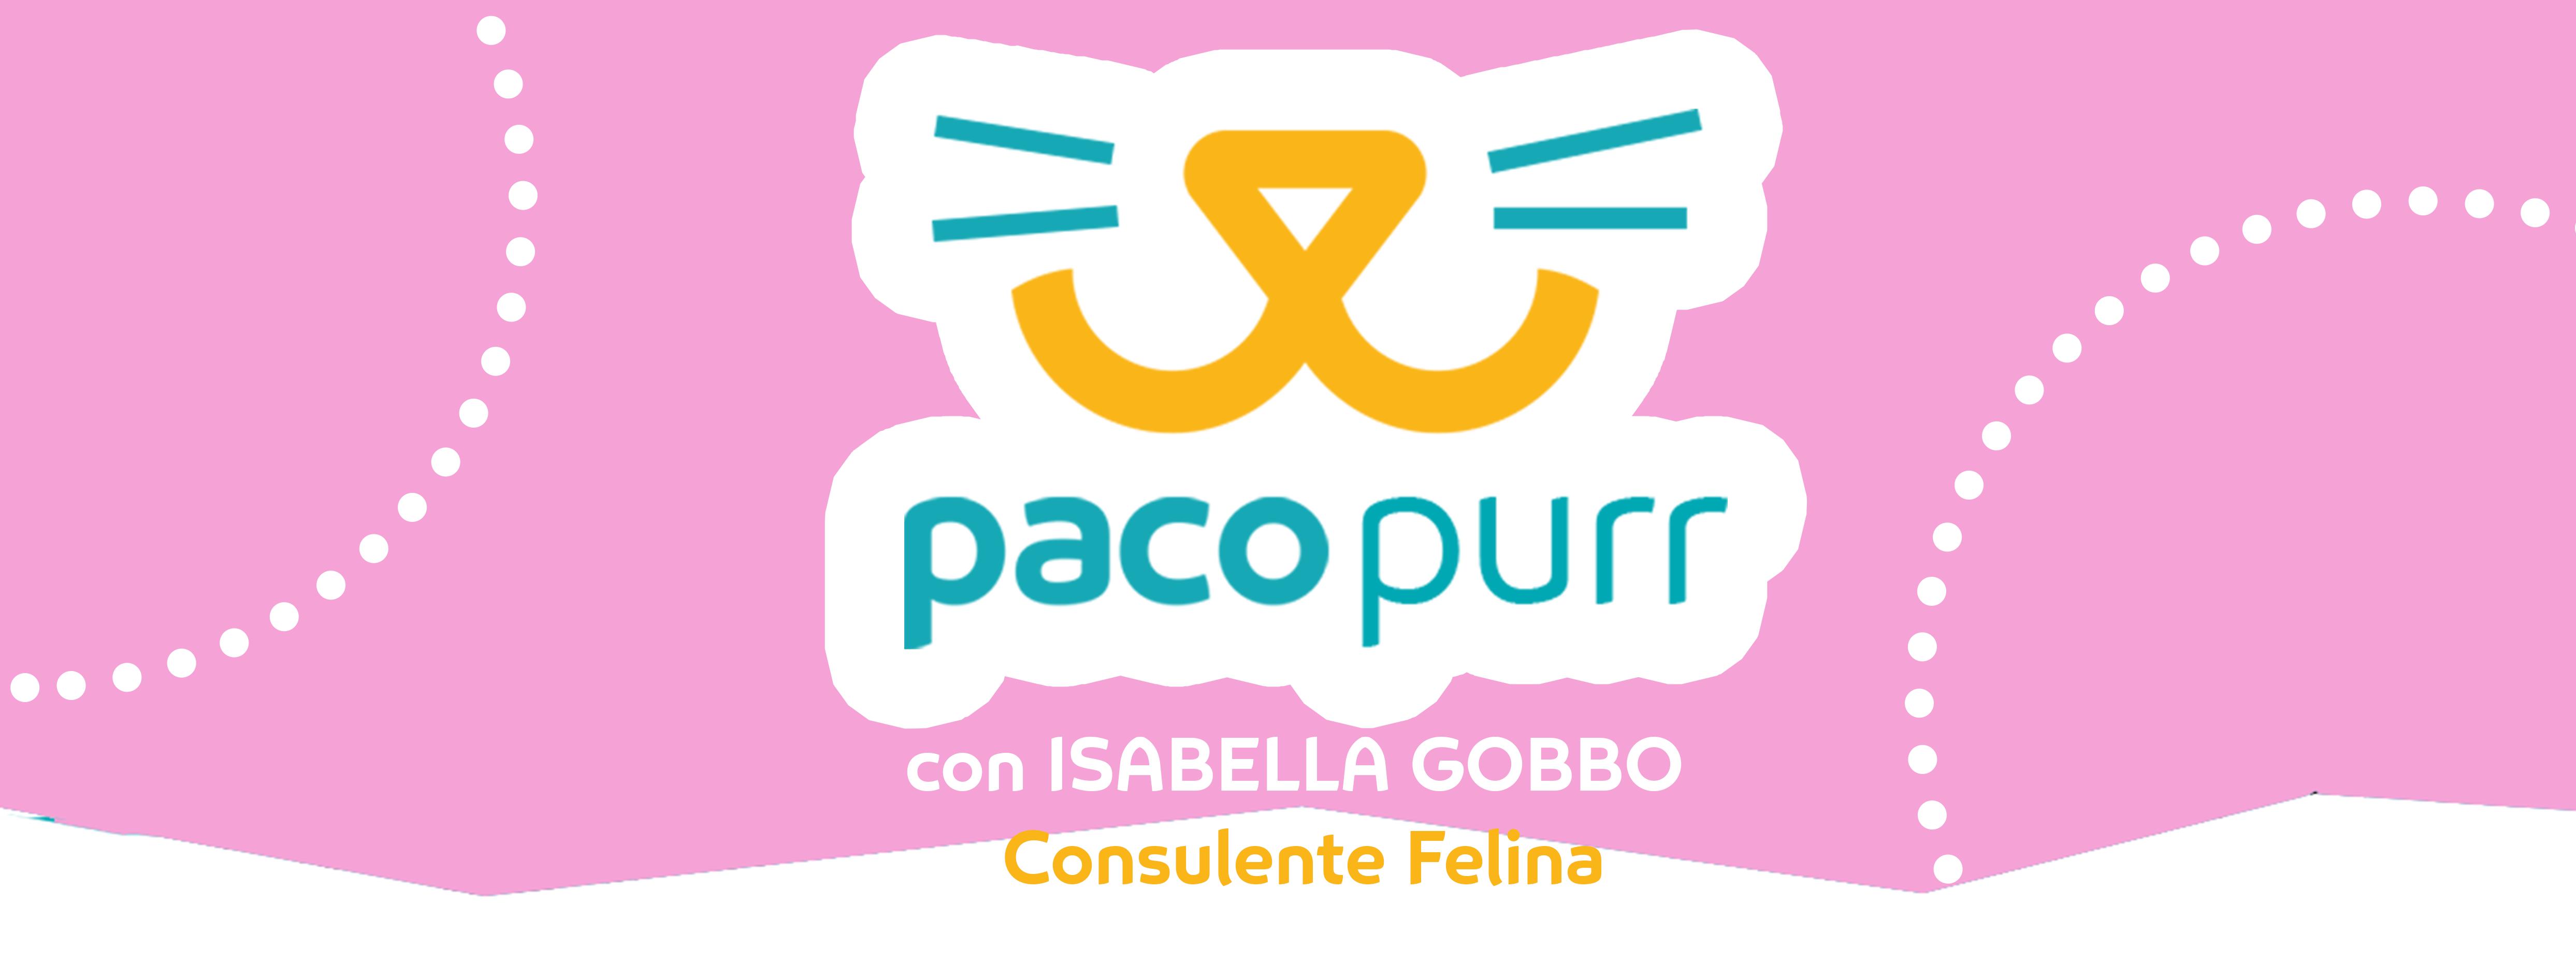 copertina-pacopurr.png